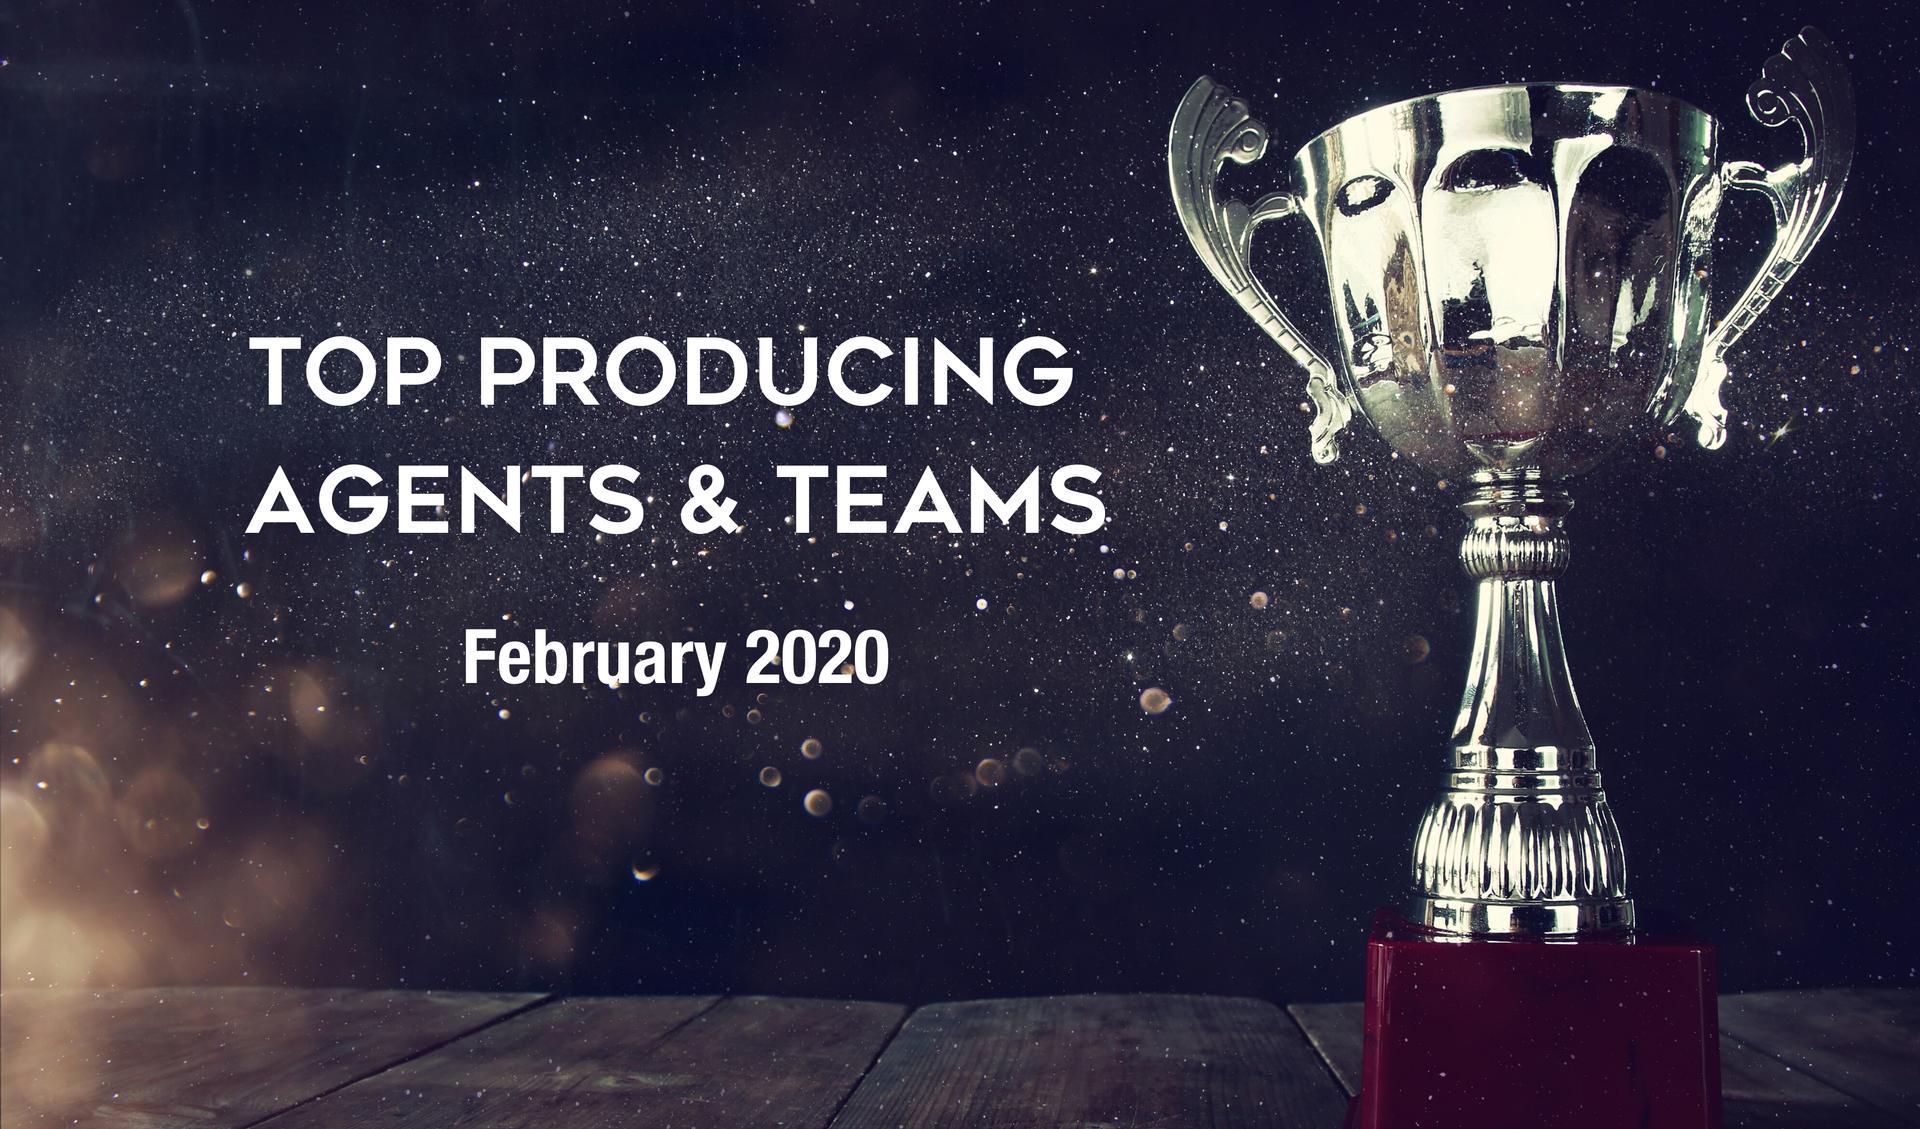 CONGRATULATIONS Top Agents & Teams - February 2020 Main Photo